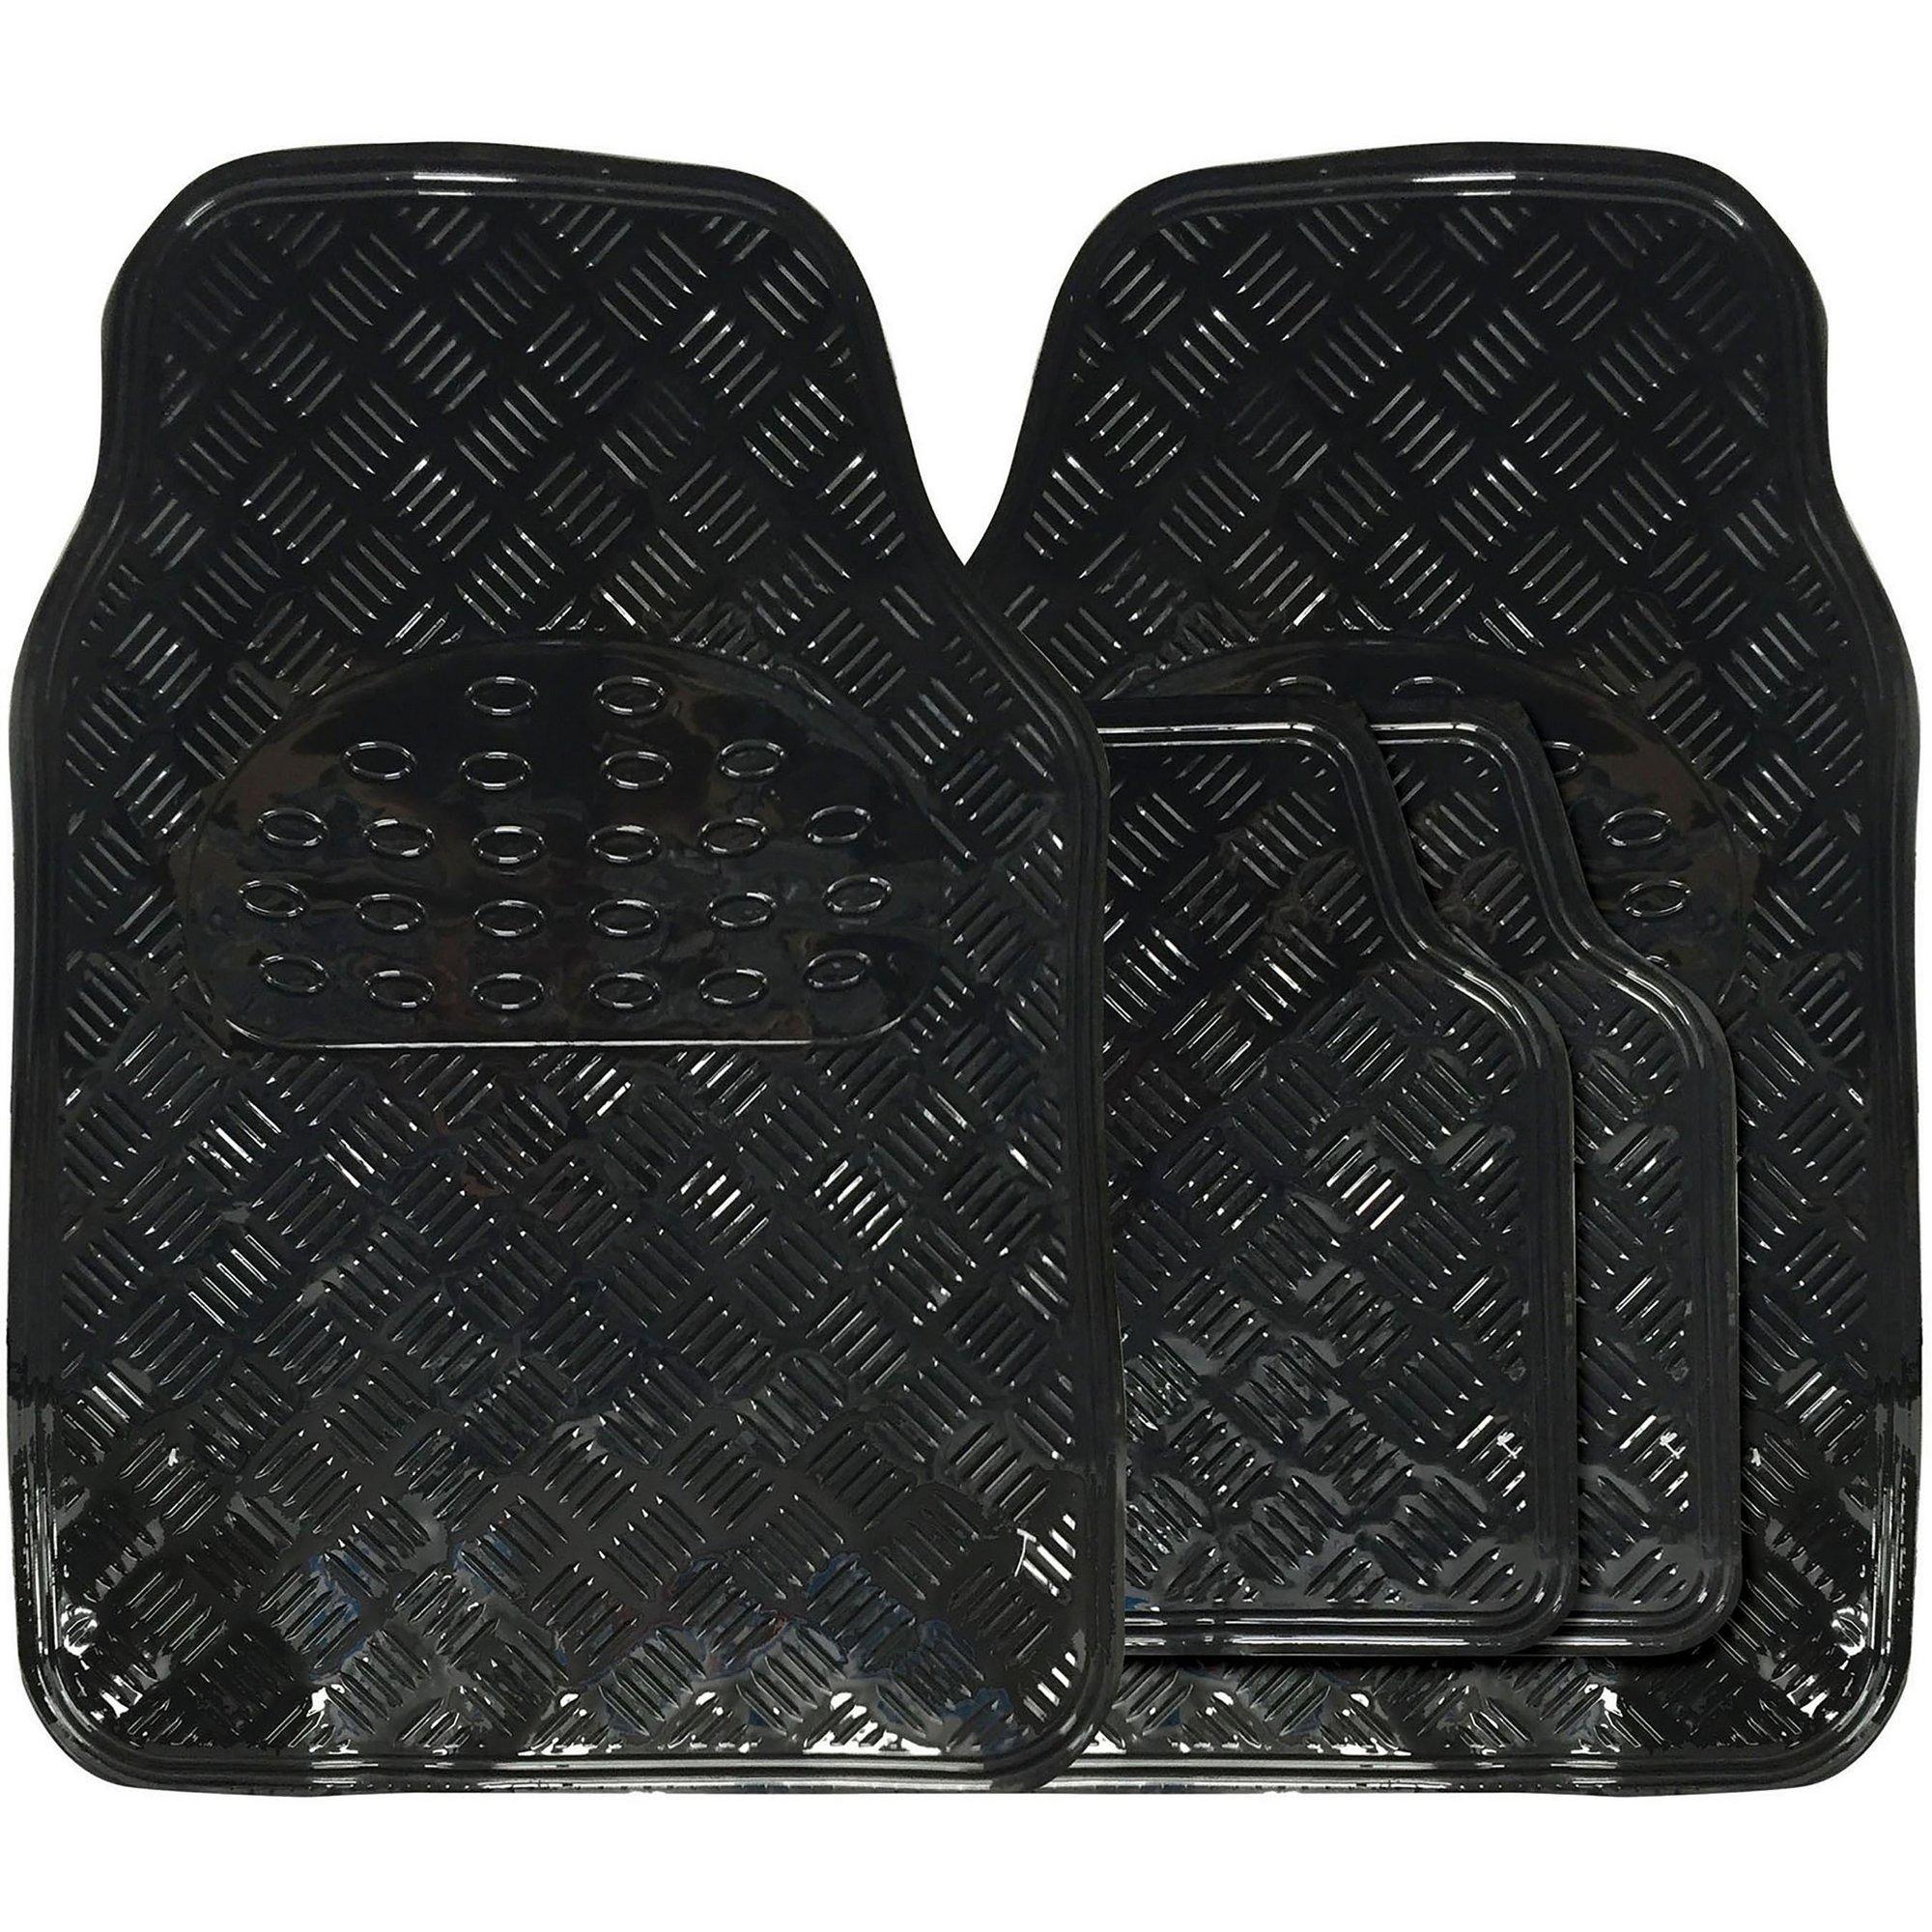 Image of Checker Plate Mat Set